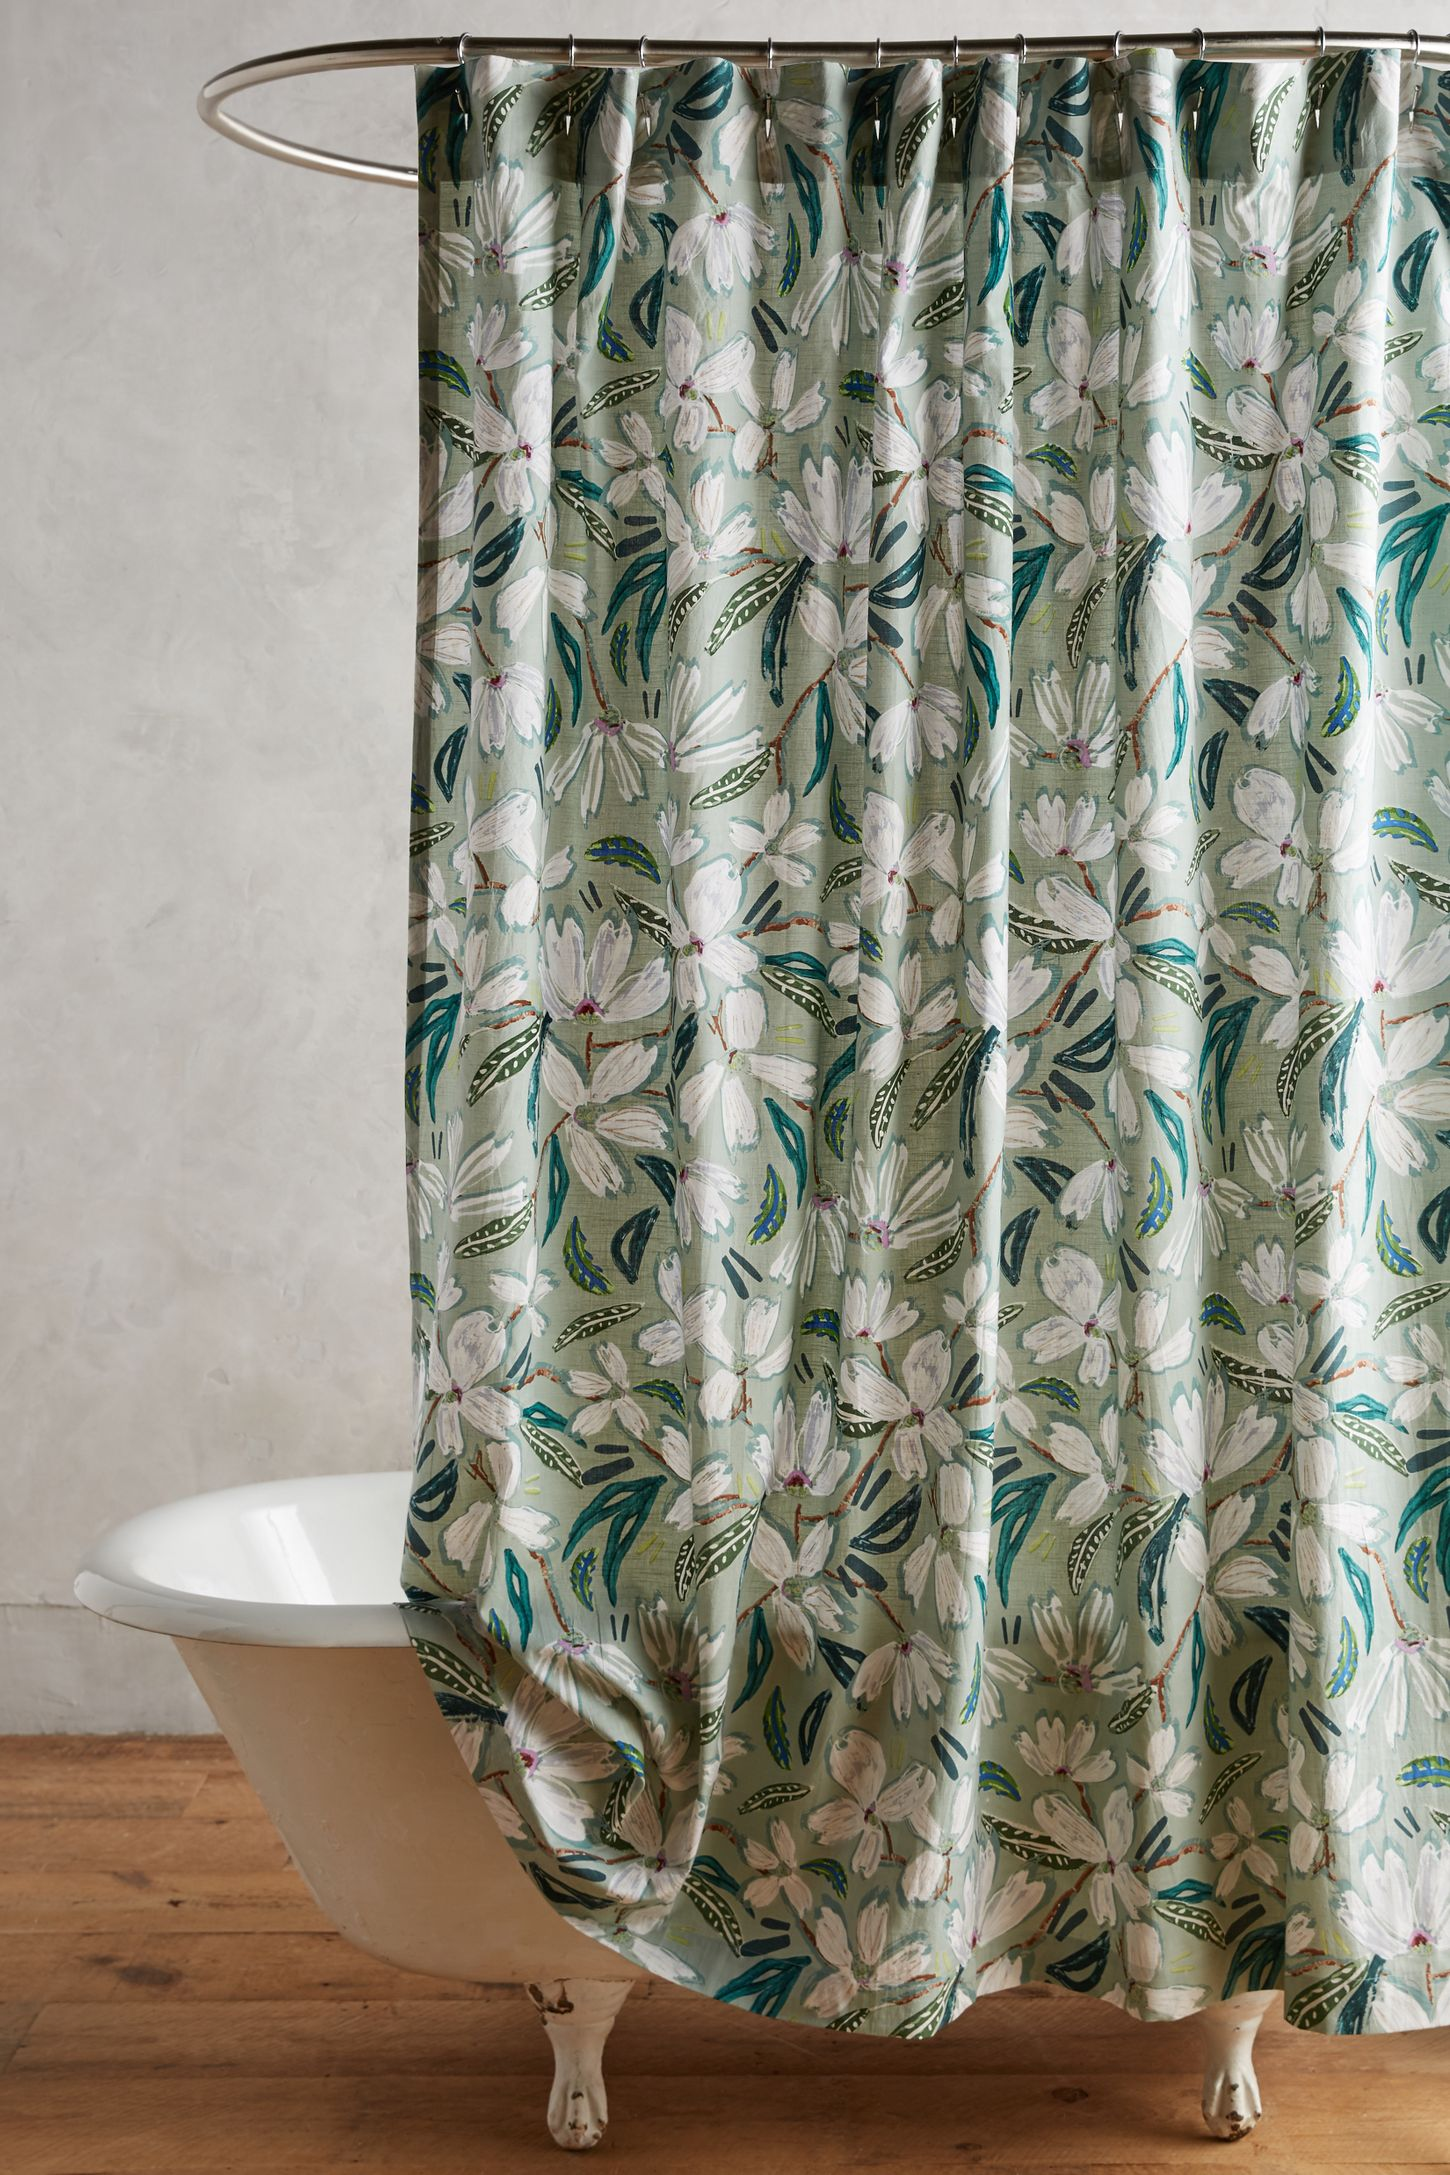 Anthropologie floral shower curtain - Anthropologie Floral Shower Curtain 15